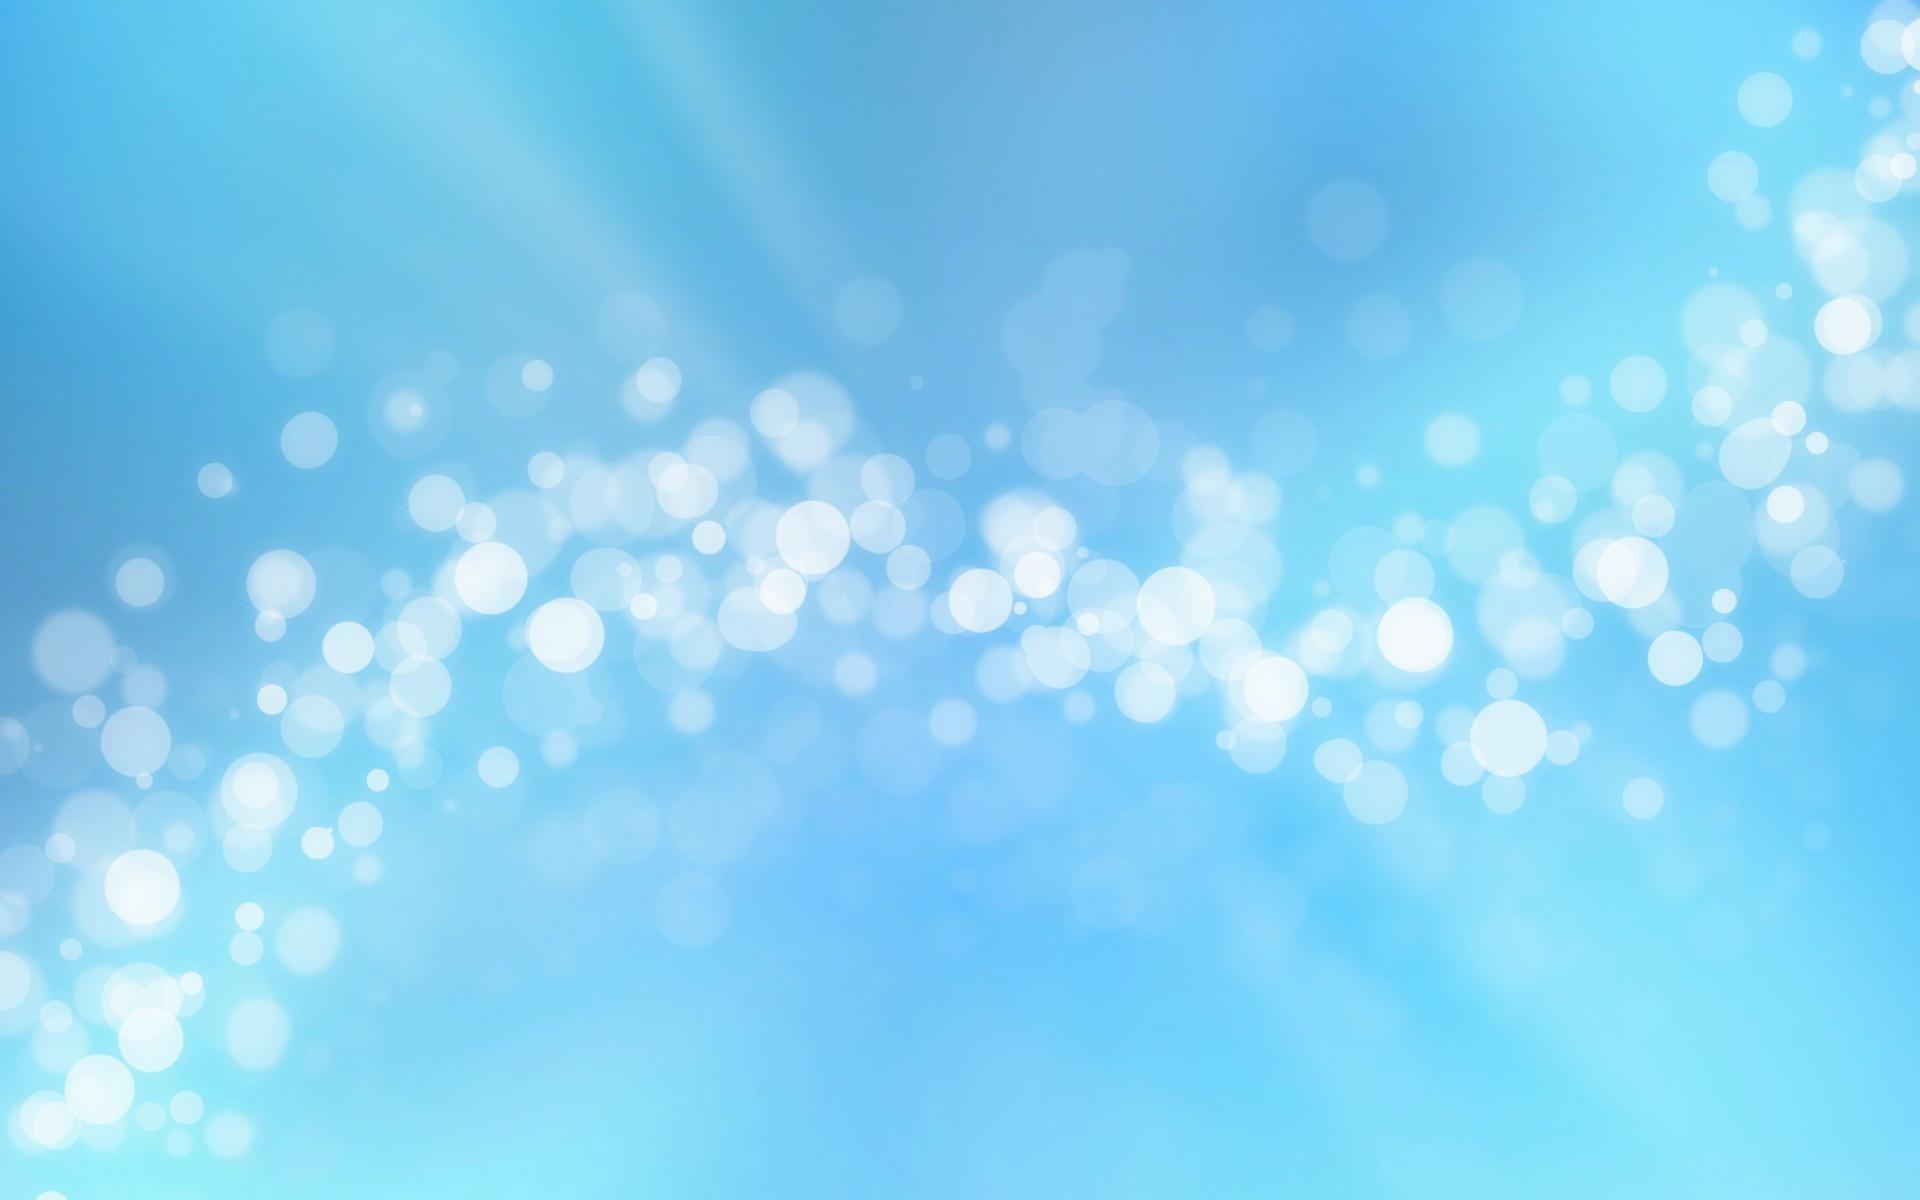 Light-Blue-Backgrounds-Free-Downlaod